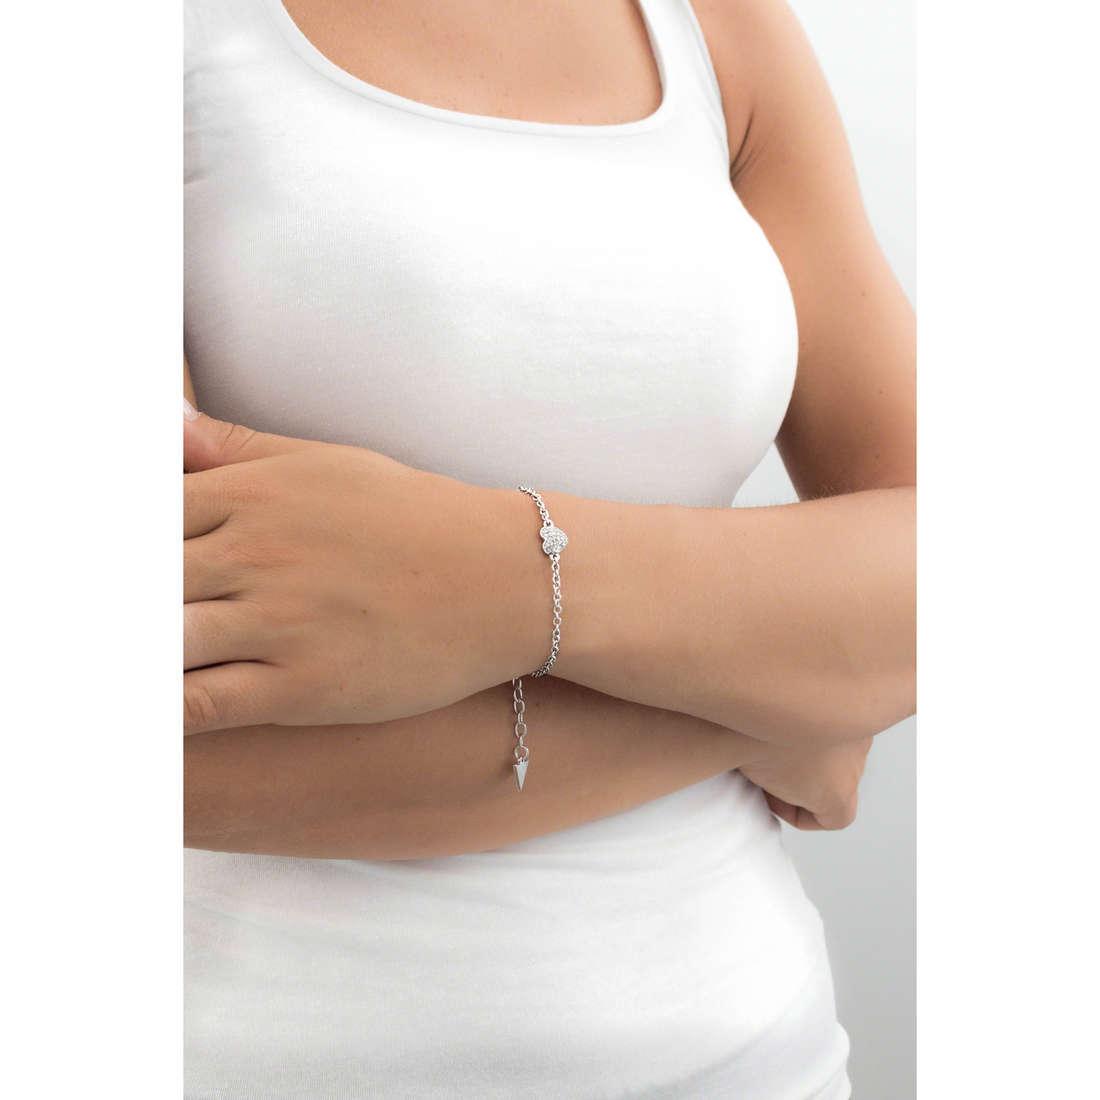 Guess bracelets Heartshelter woman UBB71518-S indosso